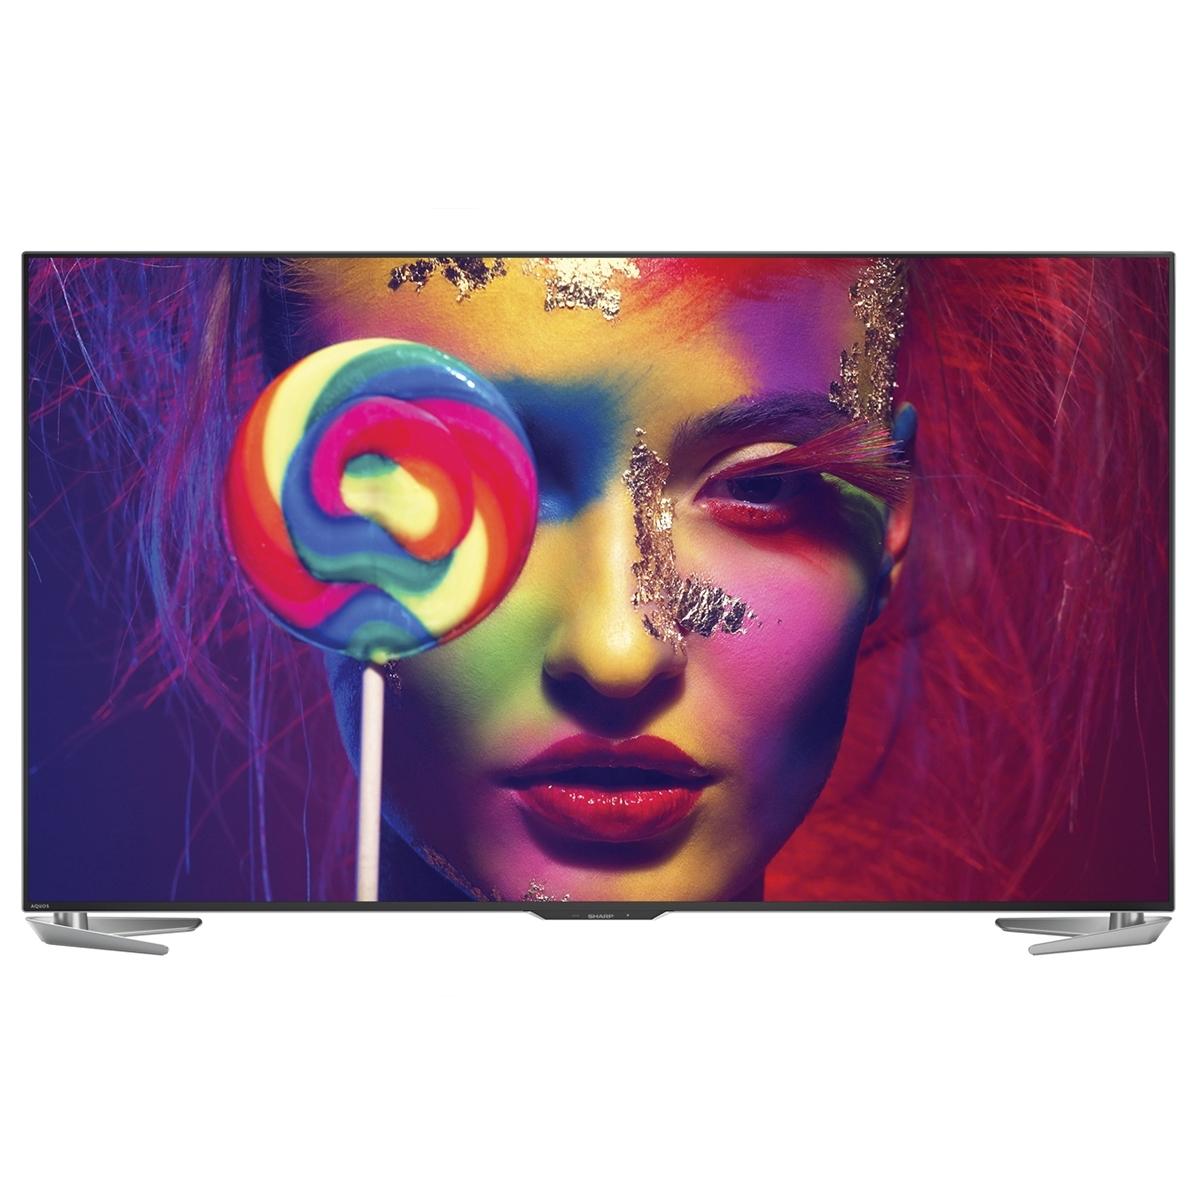 Sharp AQUOS 80inch LED 4K Ultra HDTV - LC-80UH30U